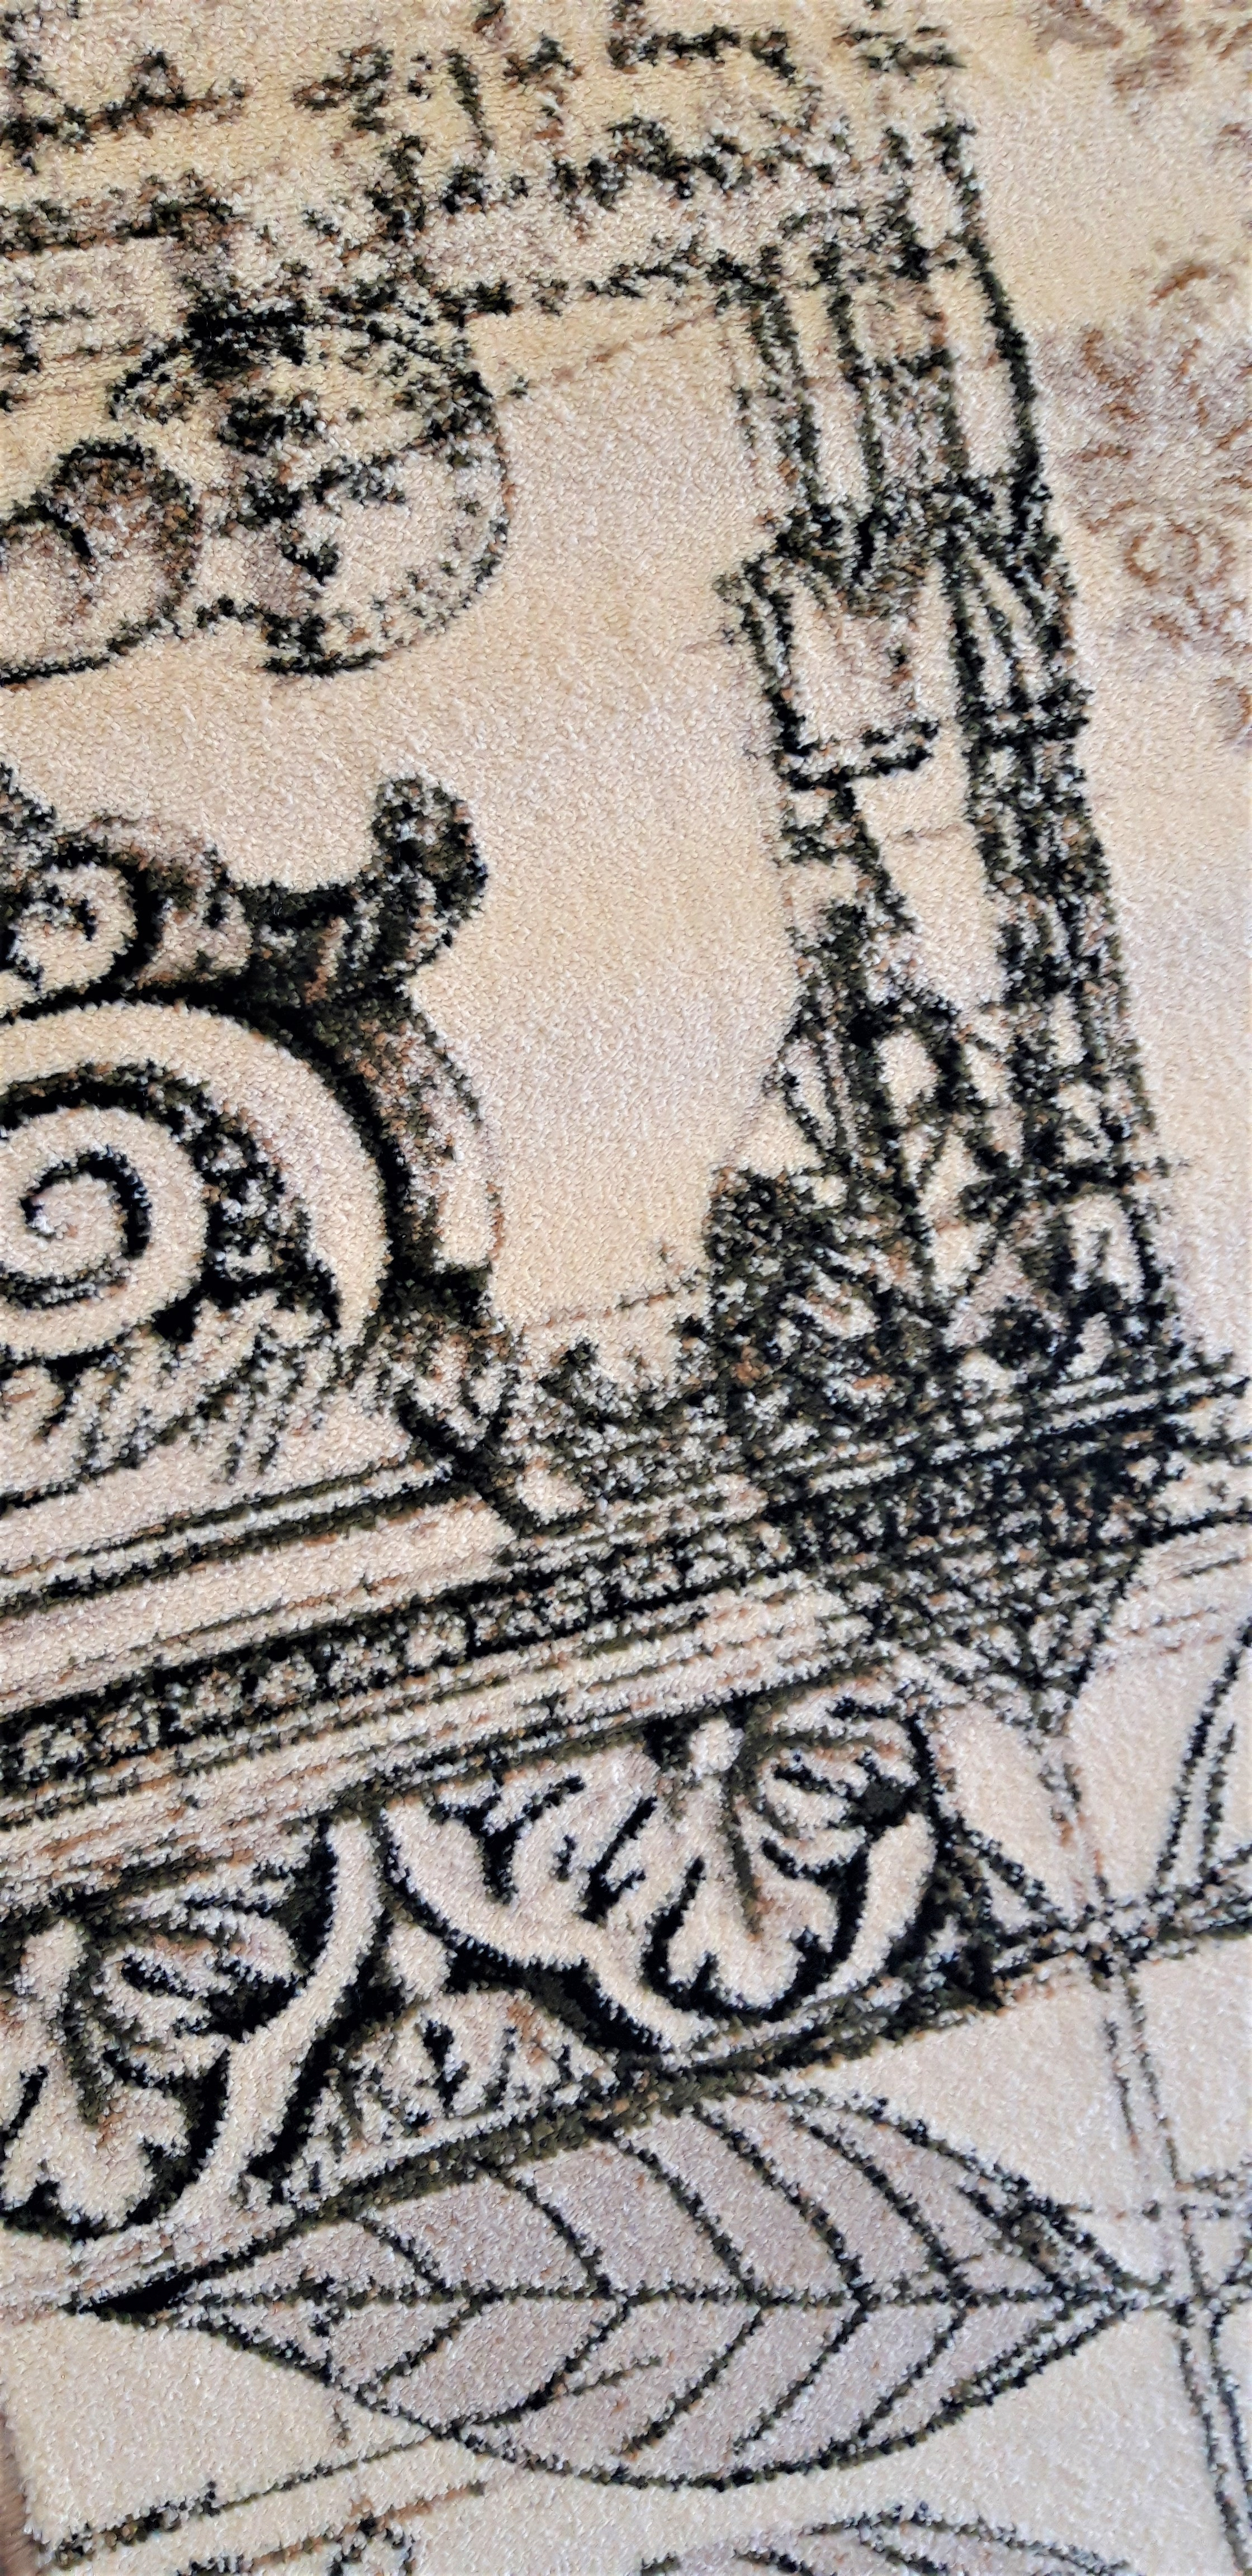 Covor Modern, Lotos Frunze 1545, Crem / Bej / Gri, Oval, 120x170 cm, 1800 gr/mp [7]